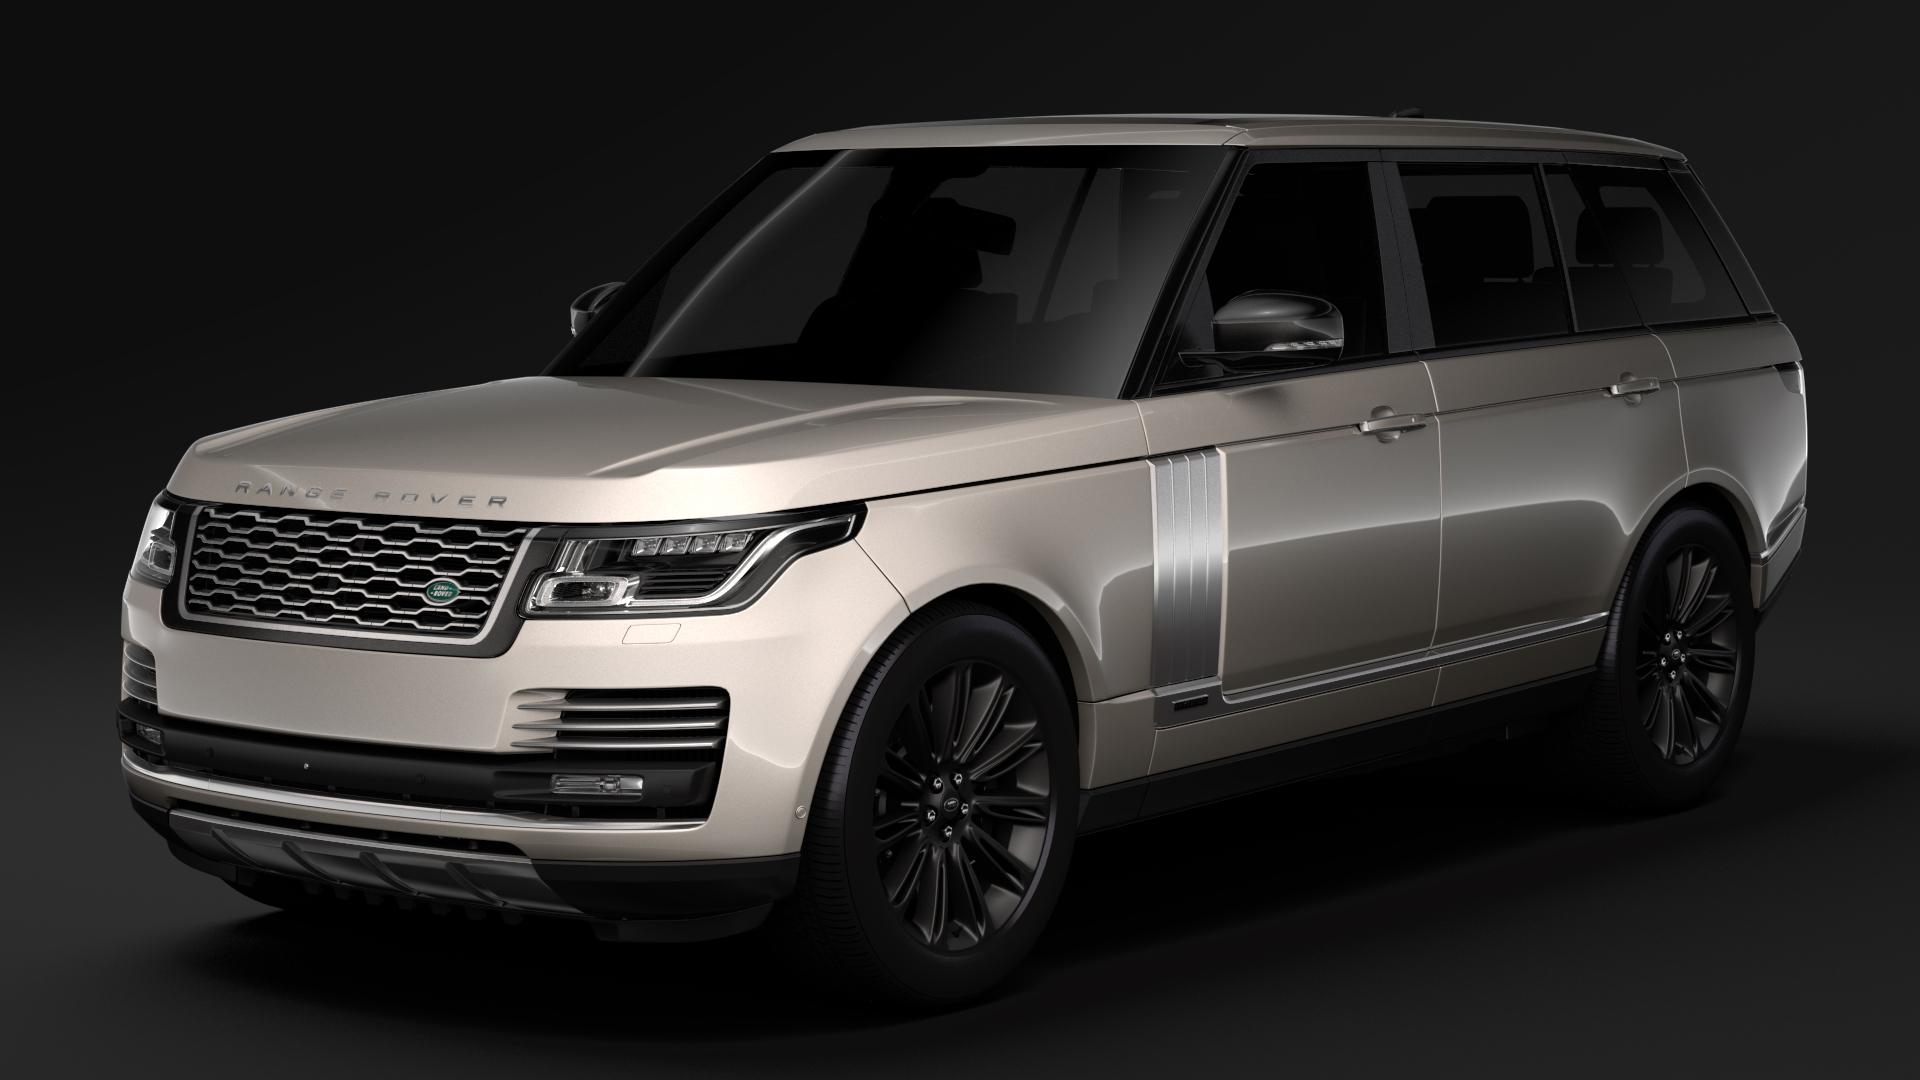 range rover autobiography hybrid lwb l405 2018 3d model max fbx c4d lwo ma mb hrc xsi obj 277294